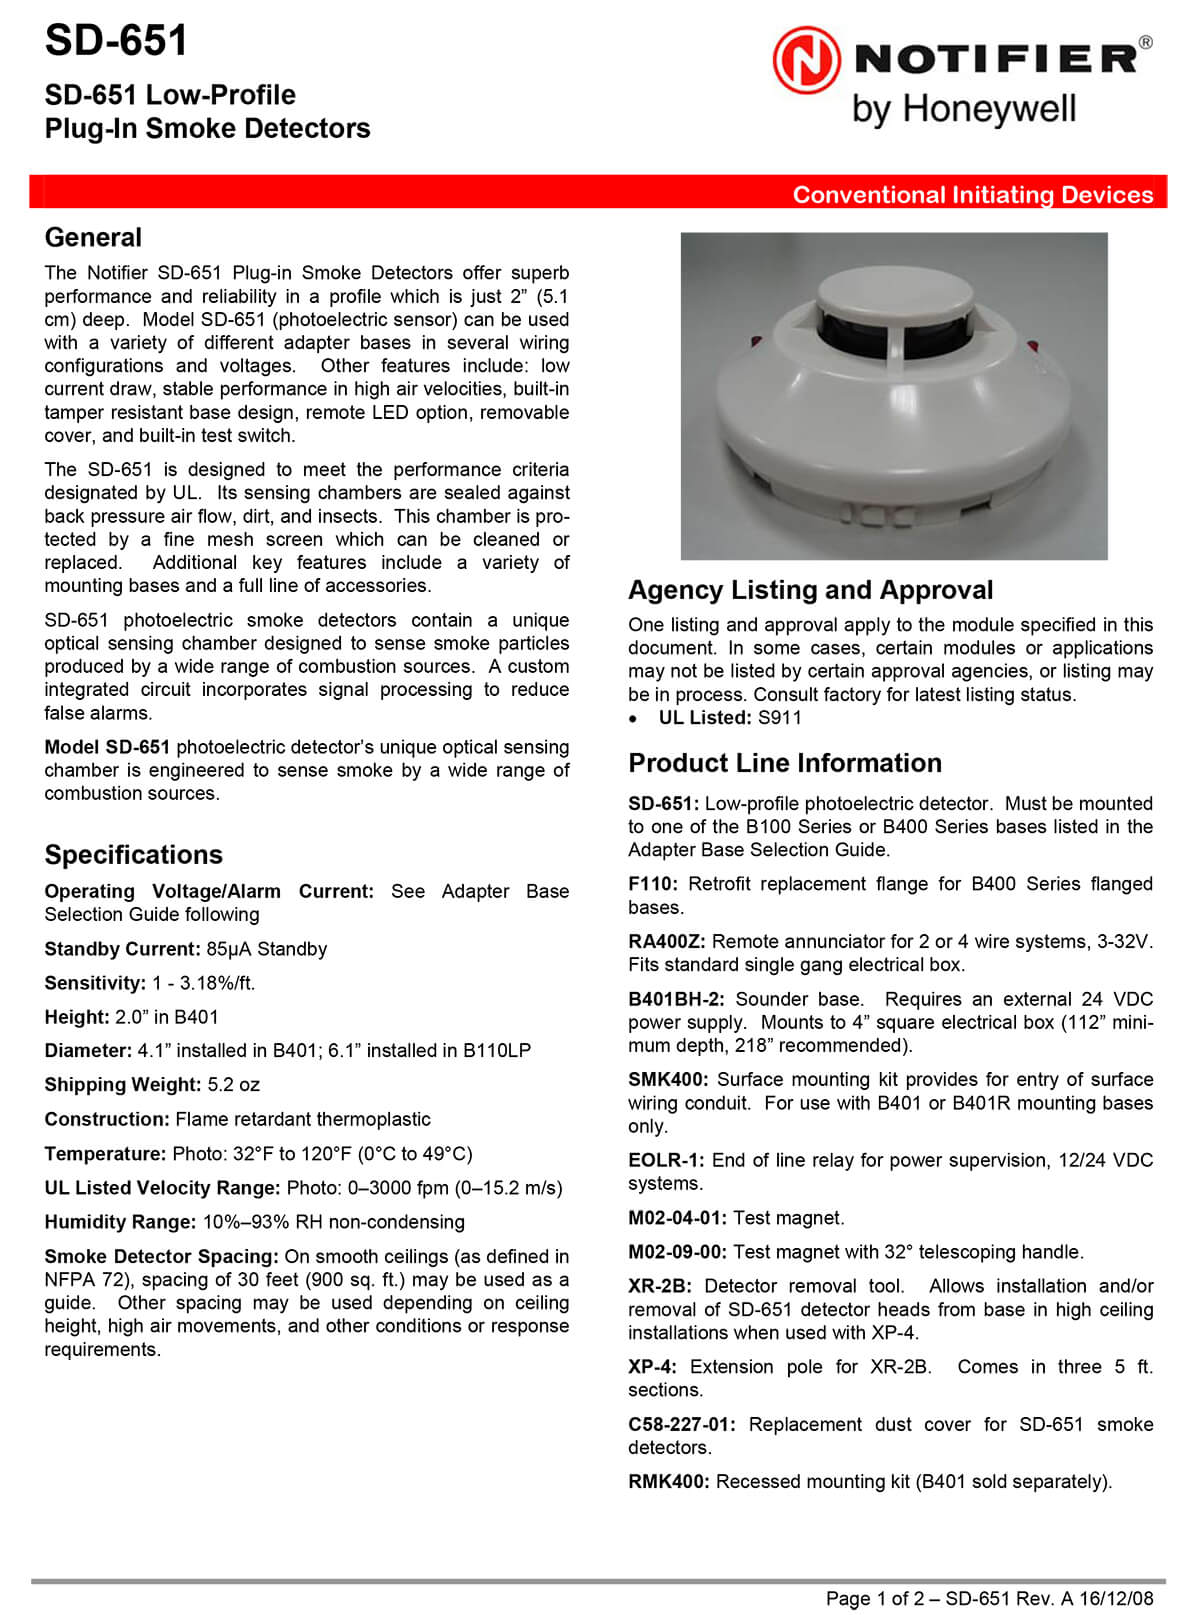 Low-Profile Plug-In Smoke Detectors SD-651